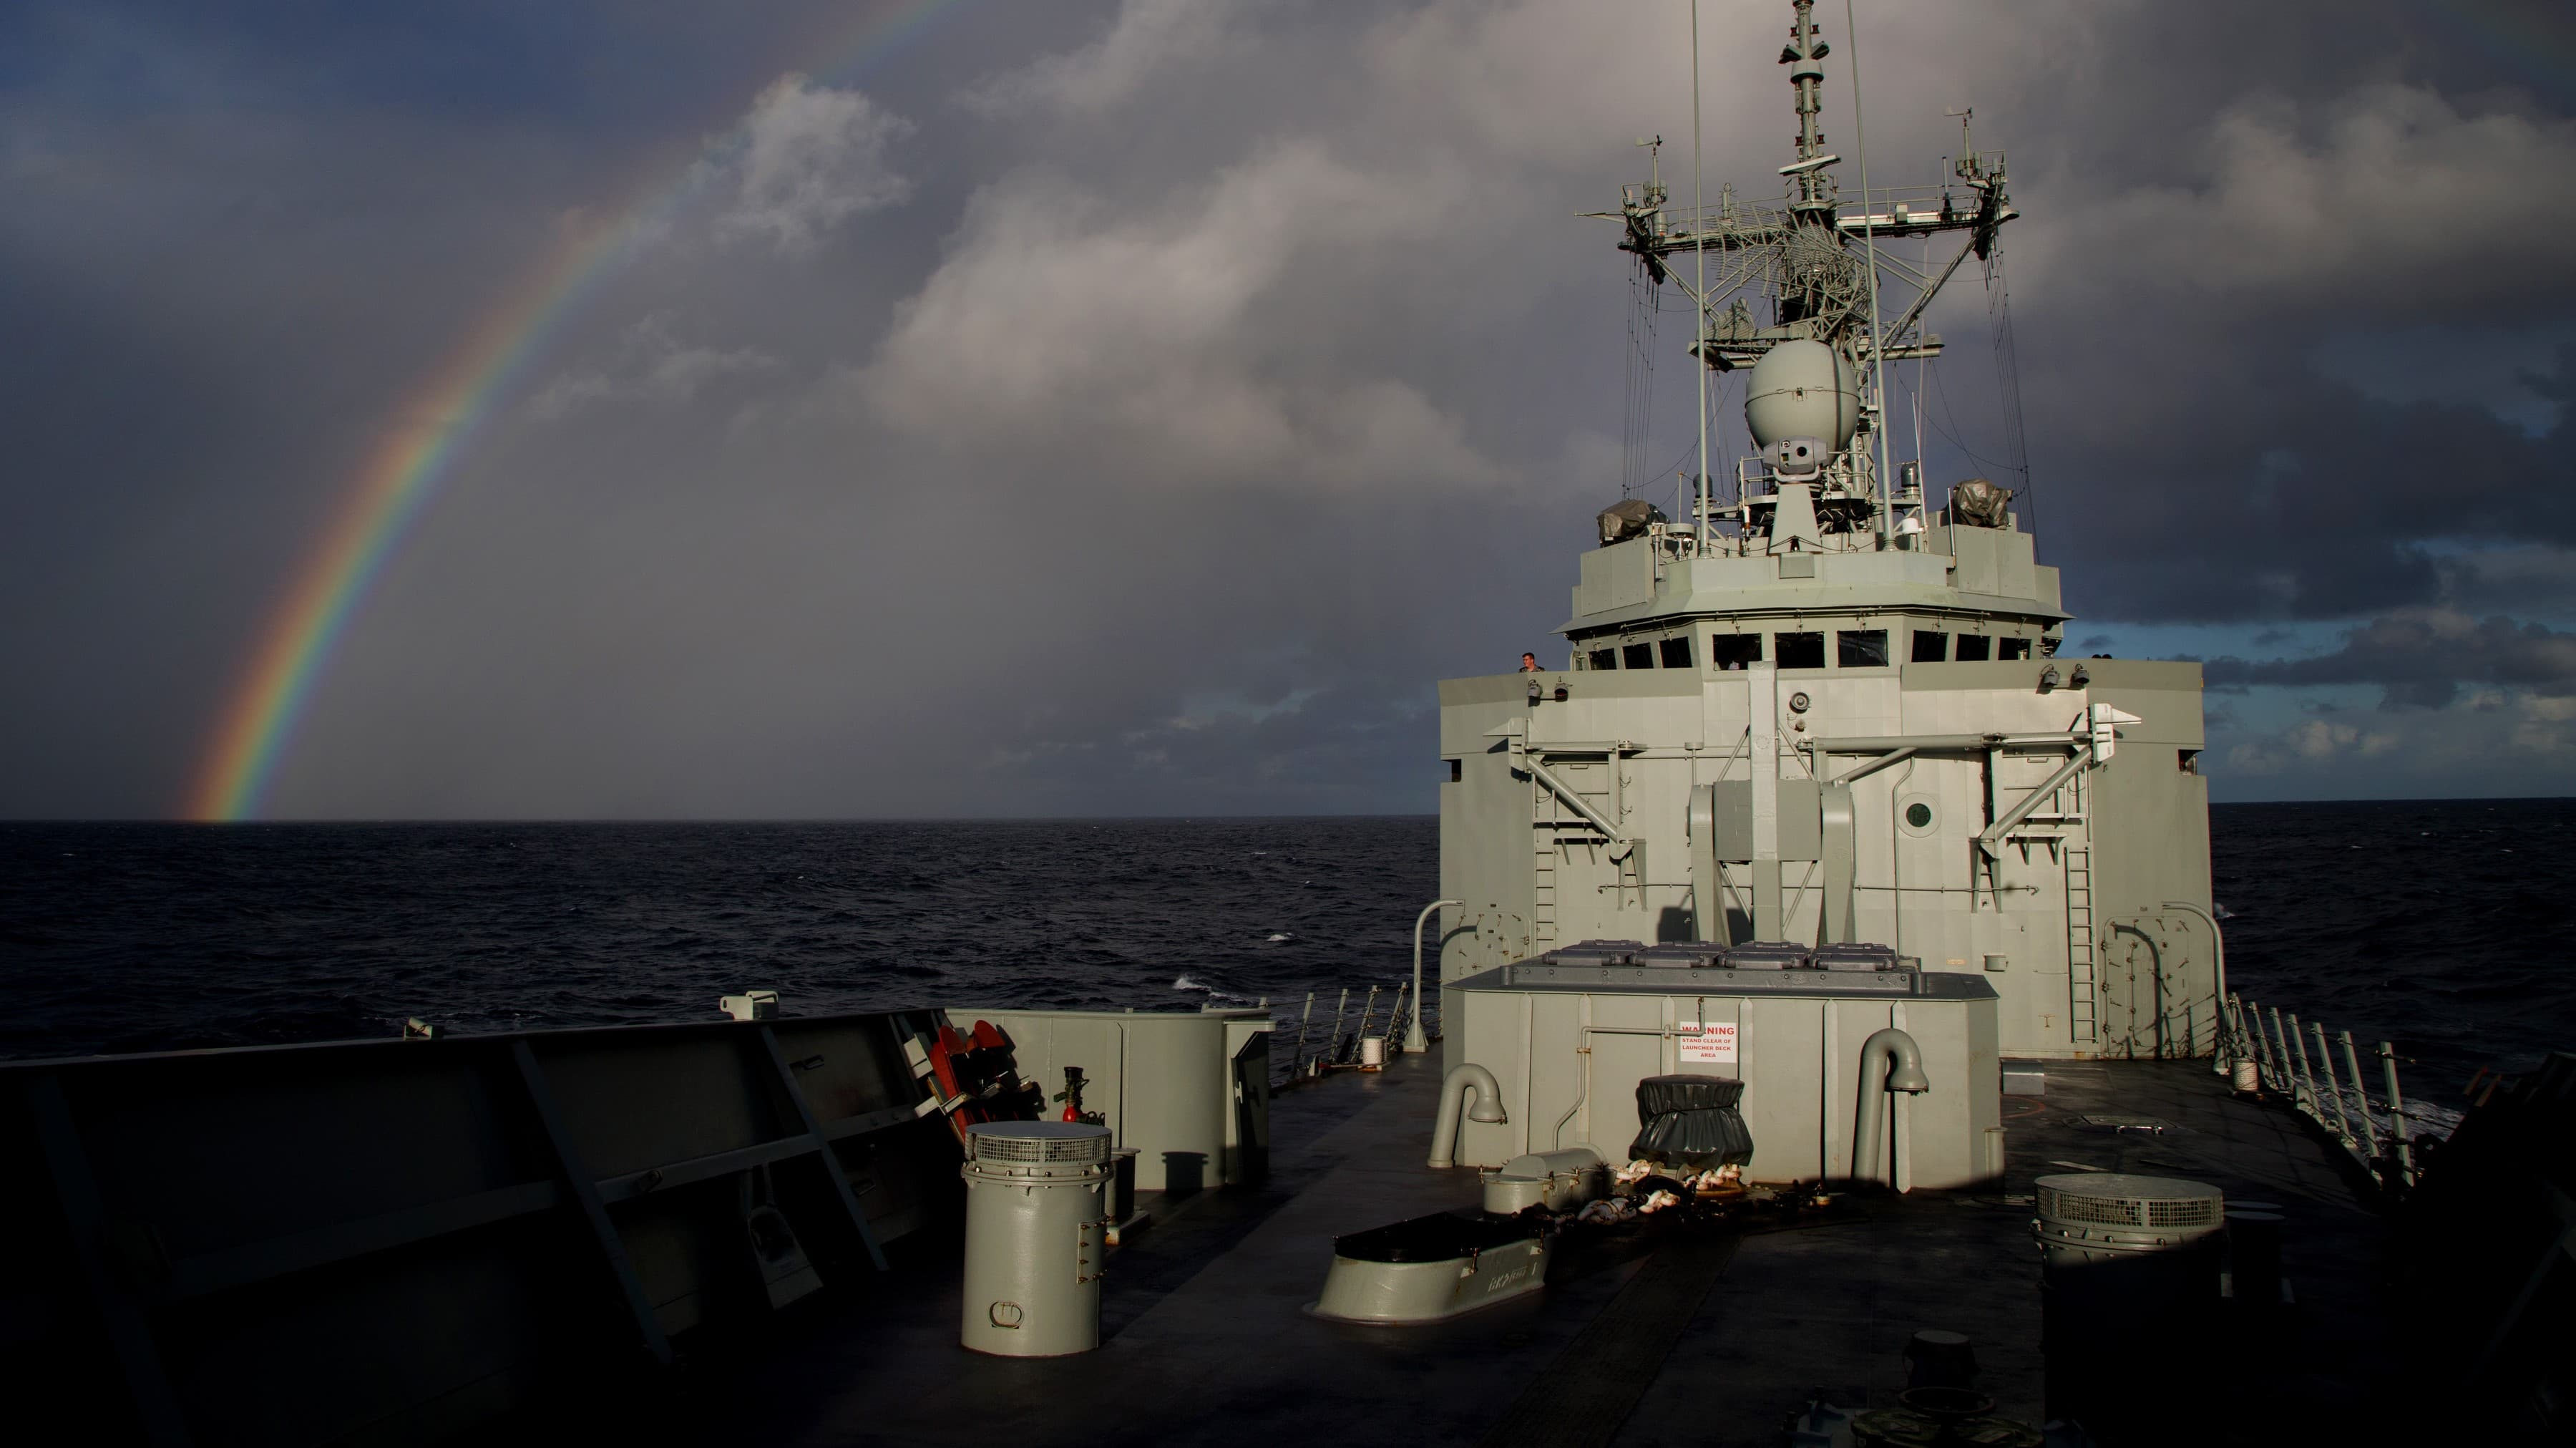 HMAS Newcastle (Photo: ABIS Nicolas Gonzalez/Commonwealth of Australia)